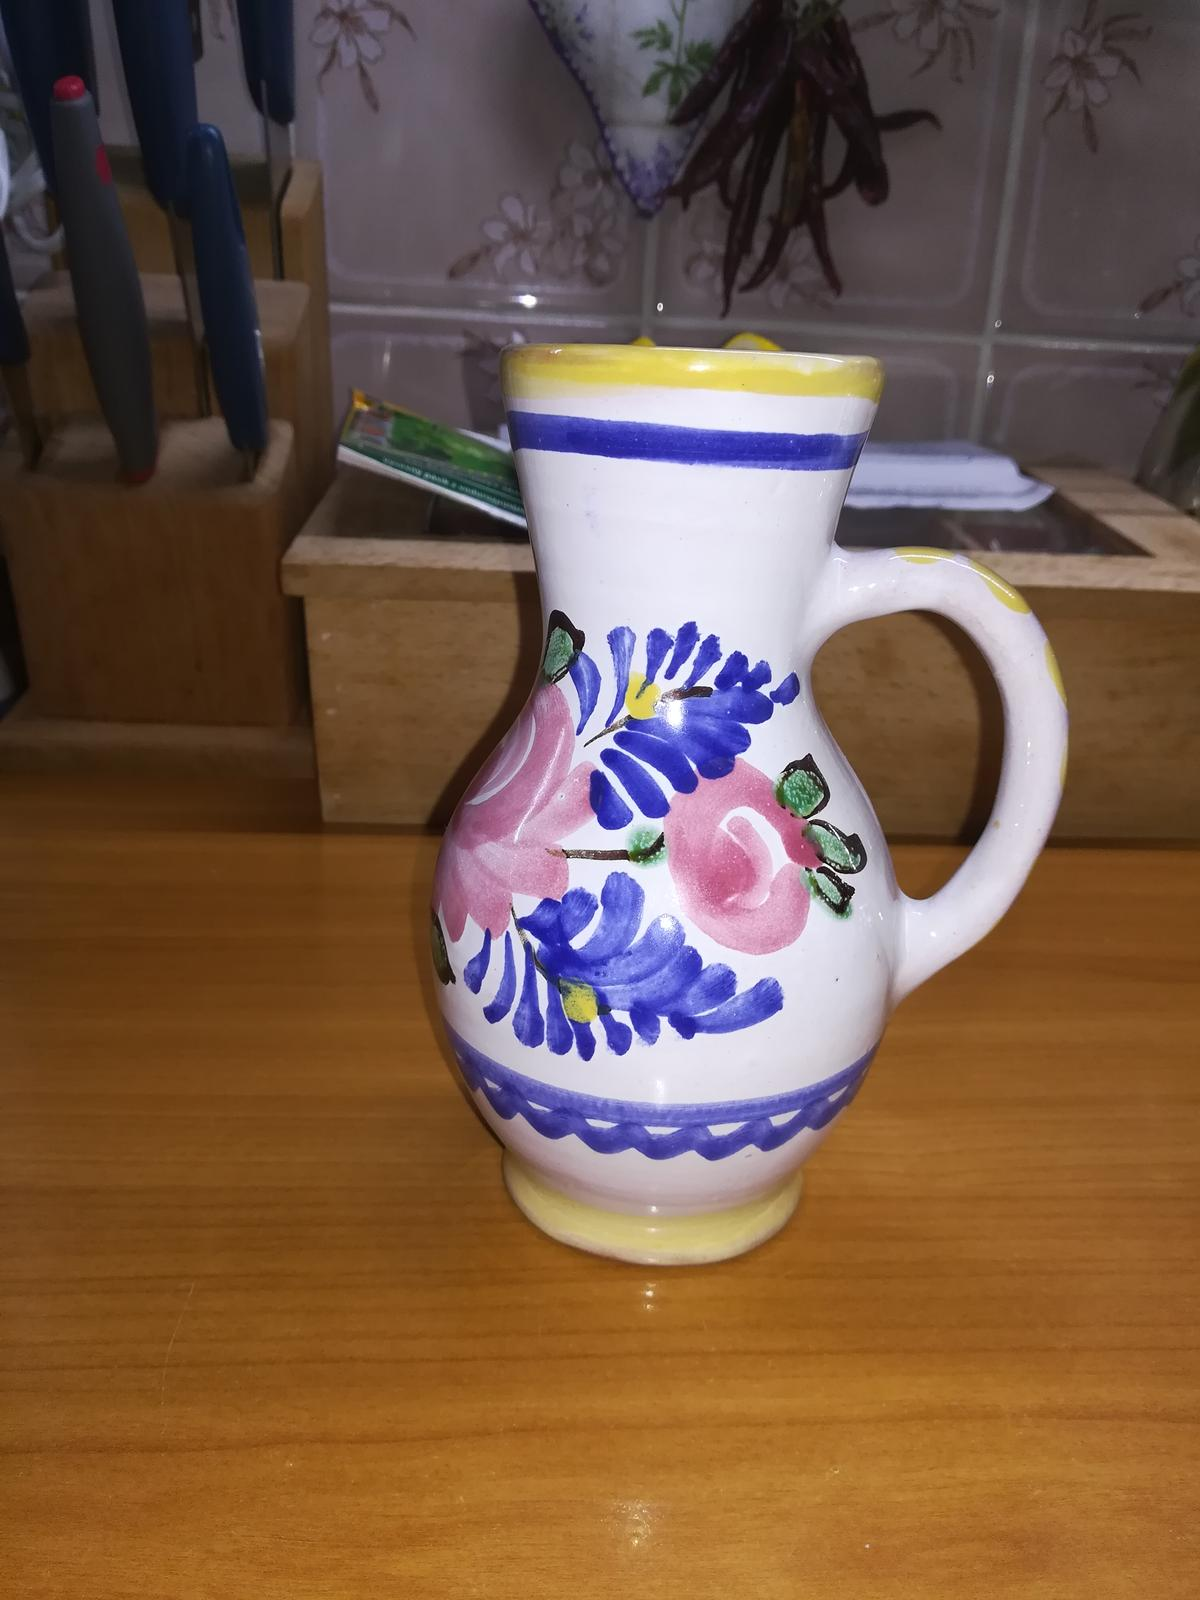 dzbanik z modranskej keramiky - Obrázok č. 1